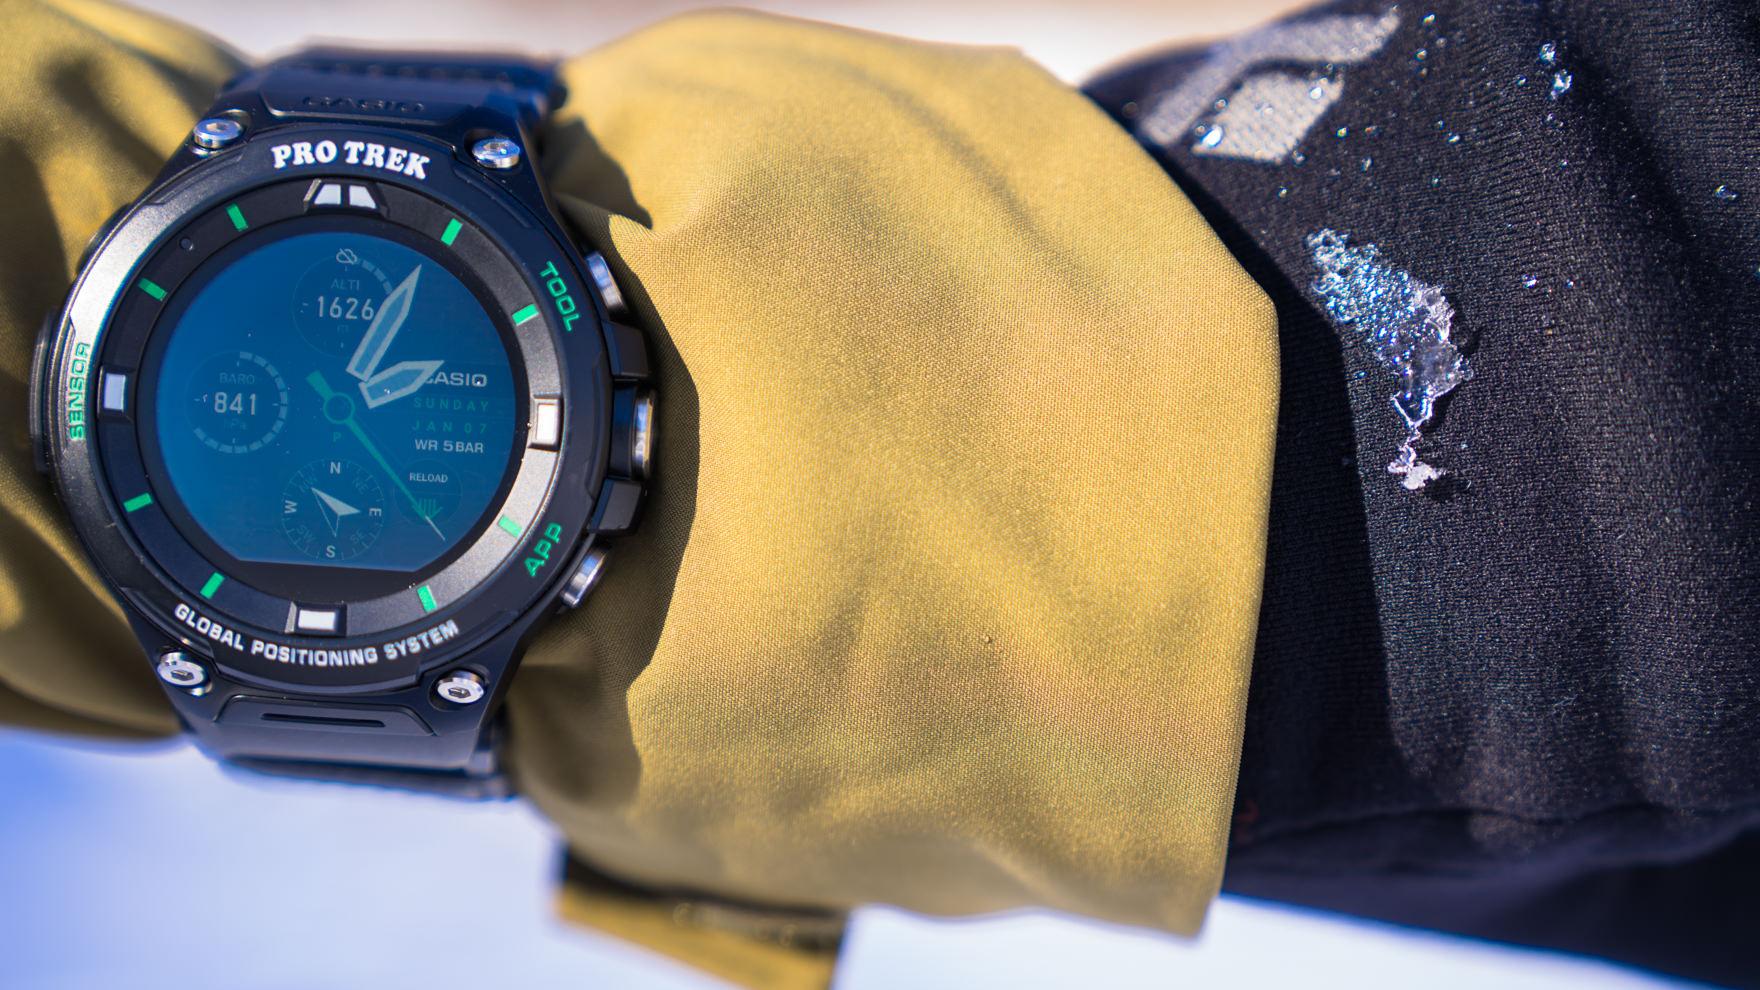 337b9e5f8c Review:冬仕様のカシオ PRO TREK Smart WSD-F20Xで冬のアウトドアを遊び尽くす | Outdoor Gearzine